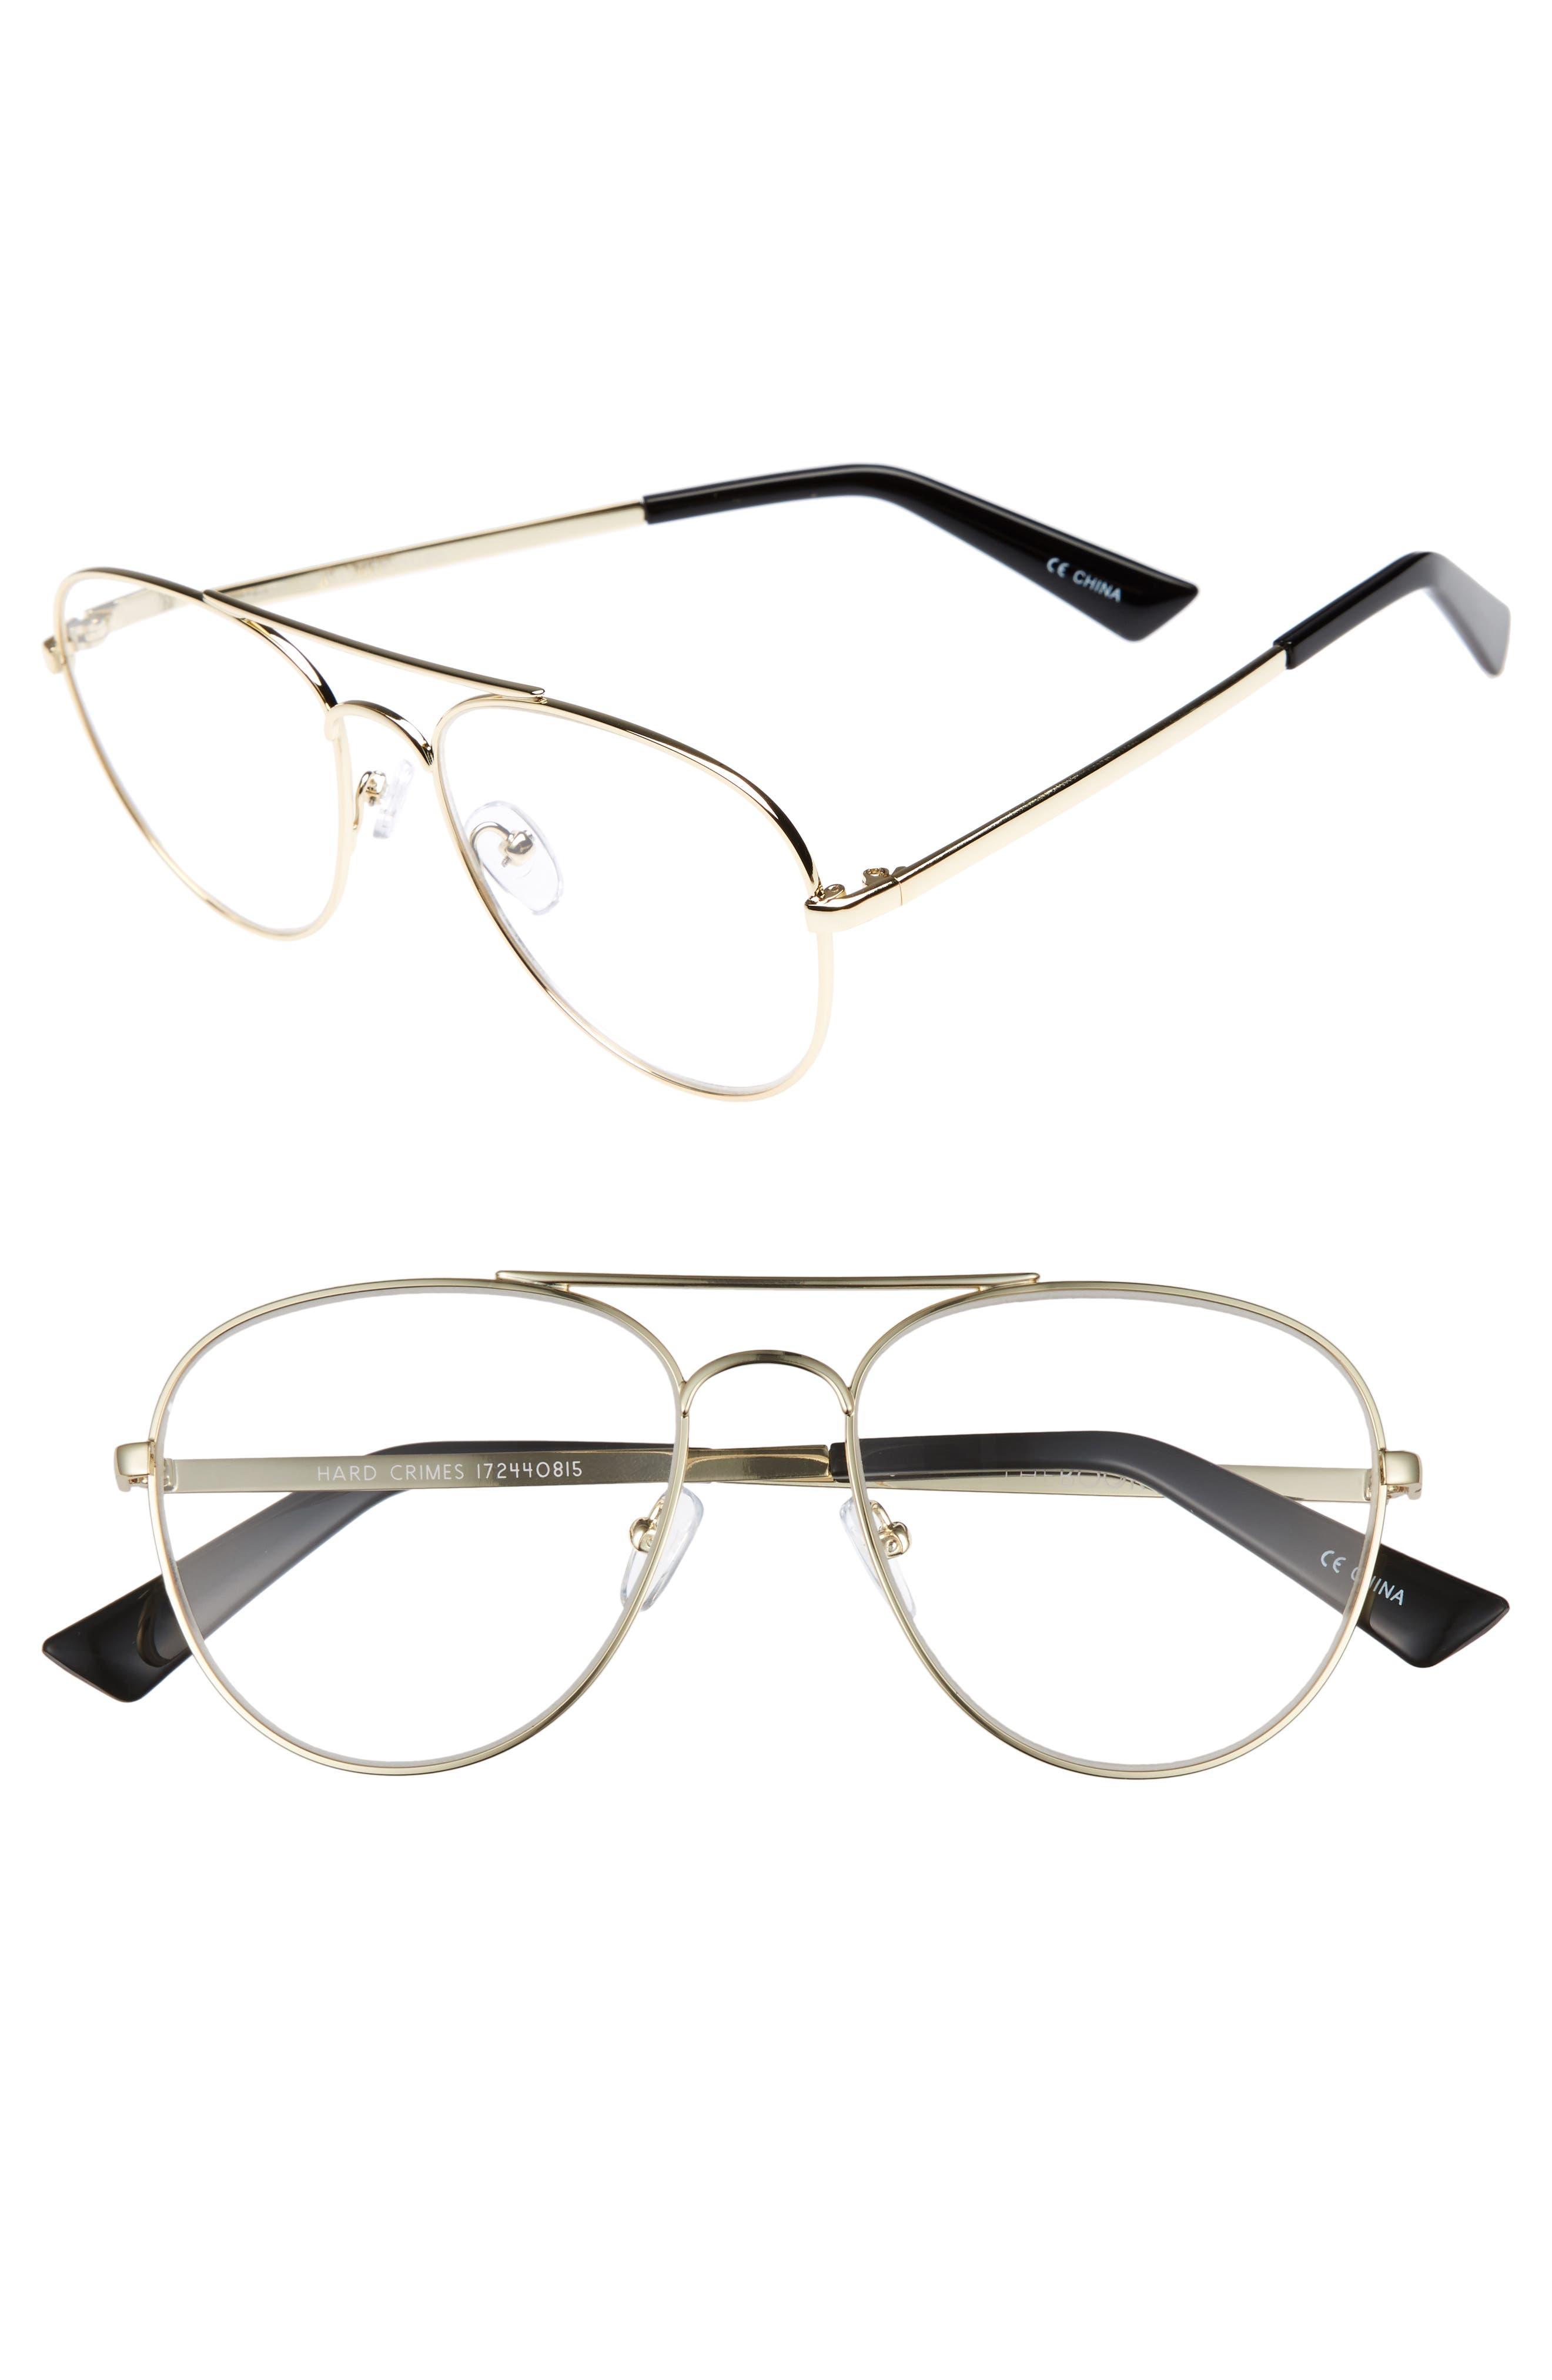 Hard Crimes 55mm Aviator Reading Glasses,                             Main thumbnail 1, color,                             Gold/ Black Marker